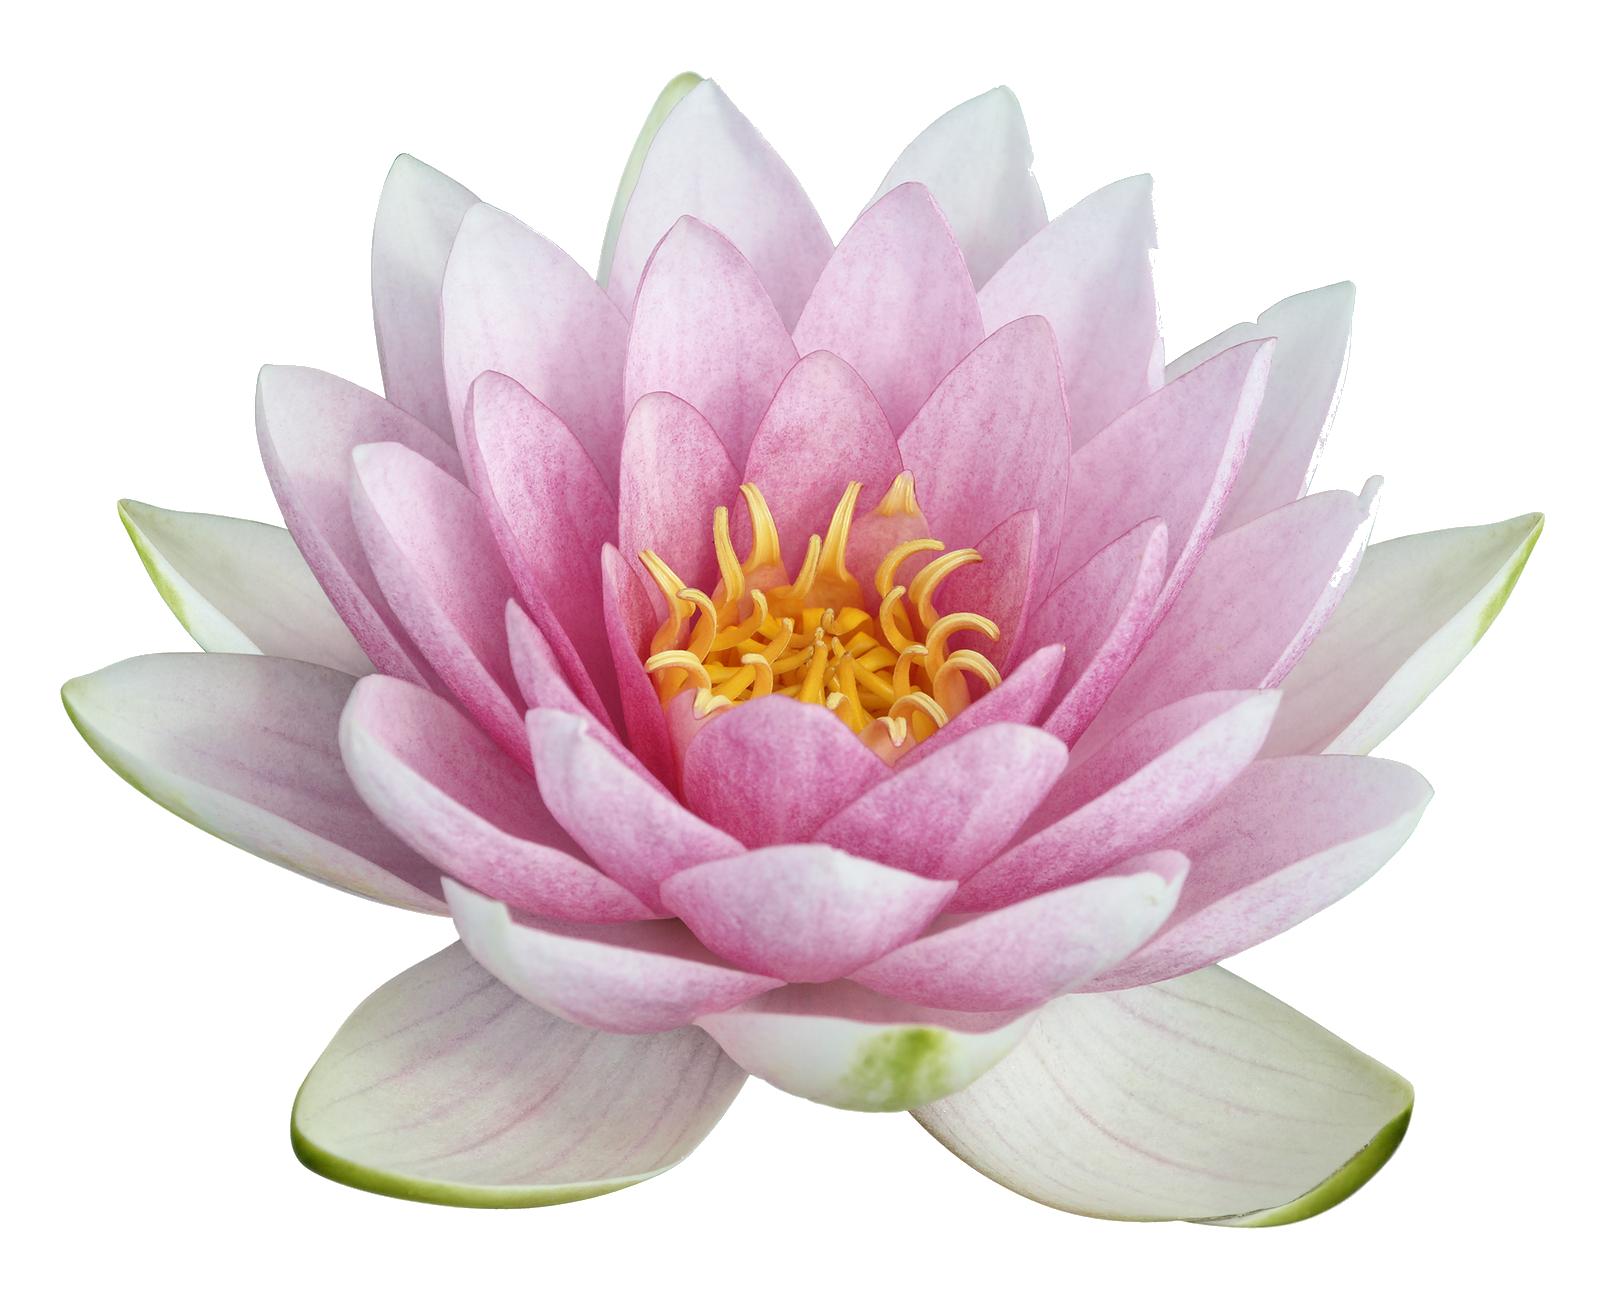 Lotus flower png. Images transparent free download